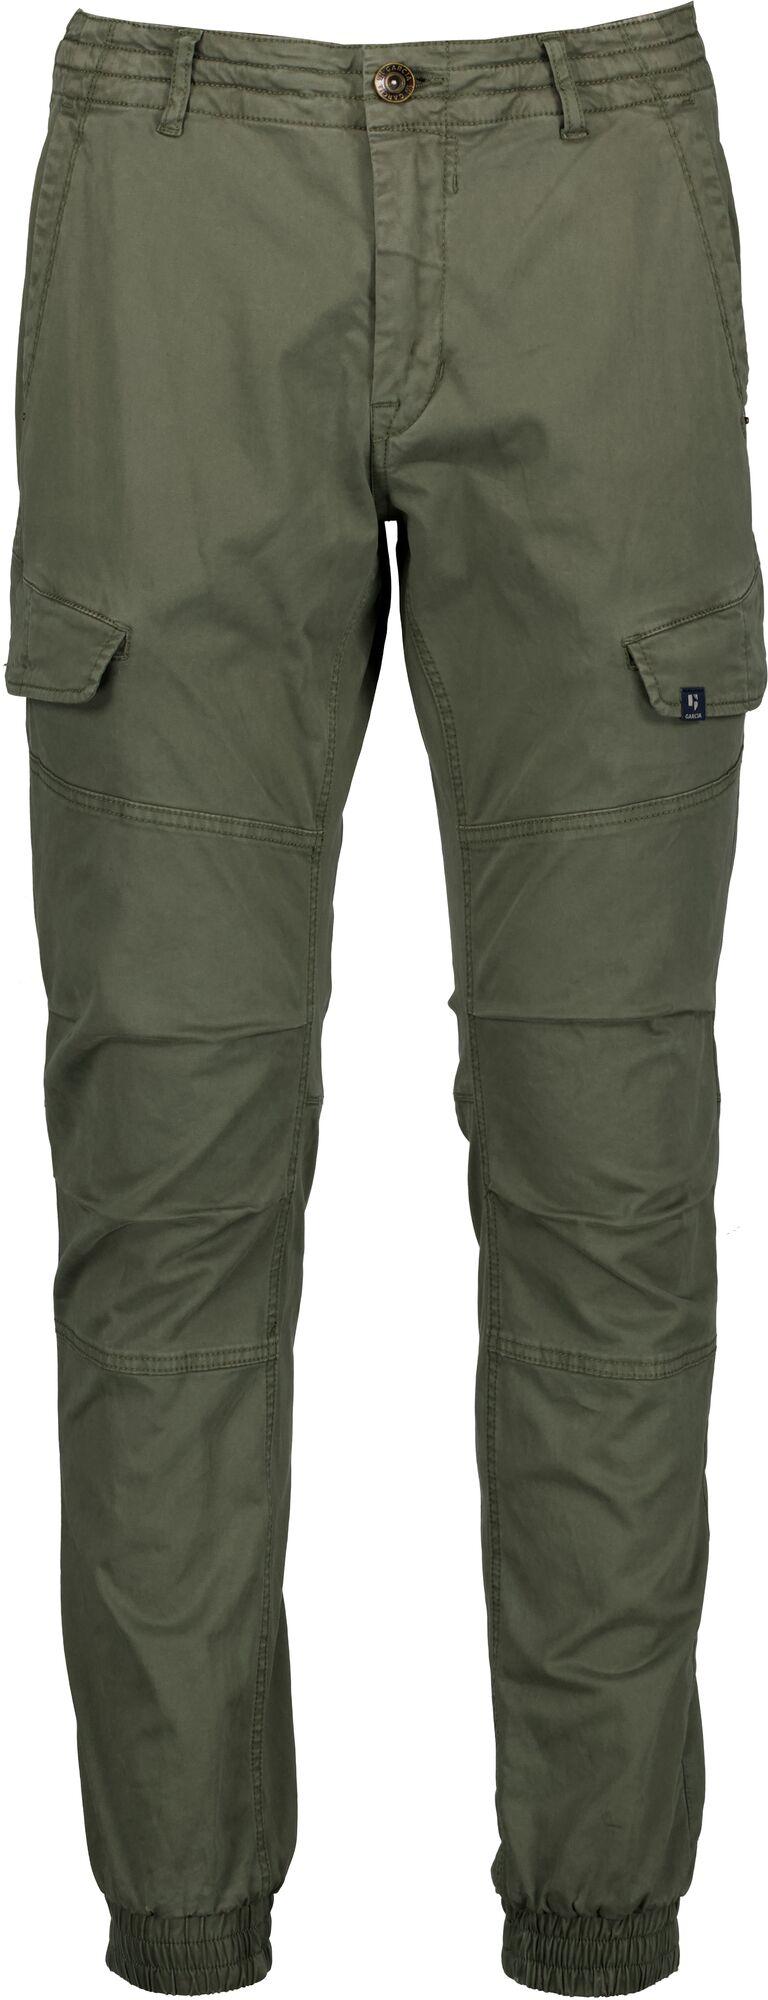 Garcia - Men-Pants n. denim